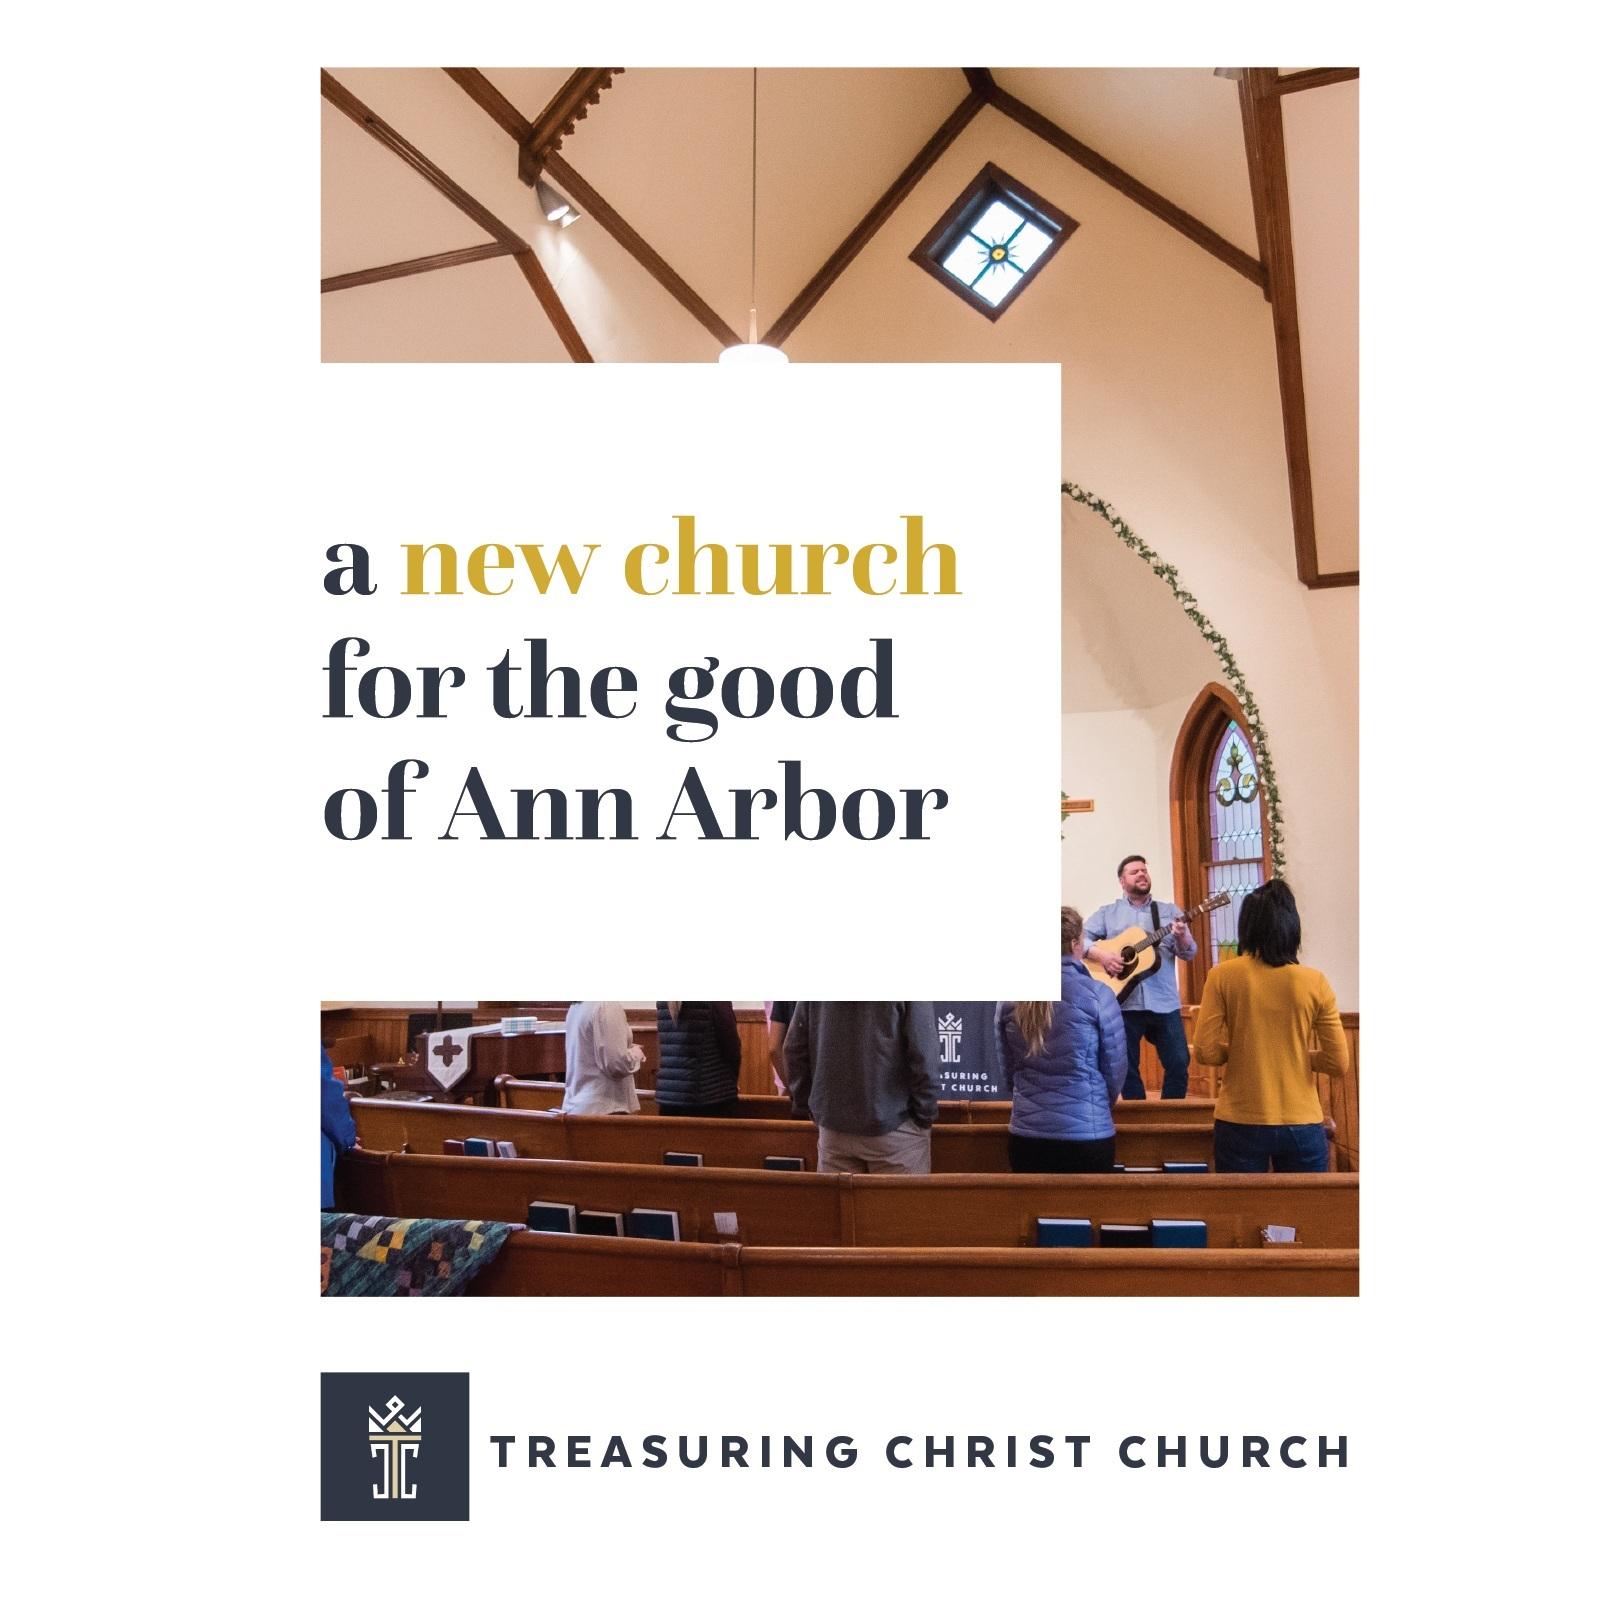 New Church in Ann Arbor